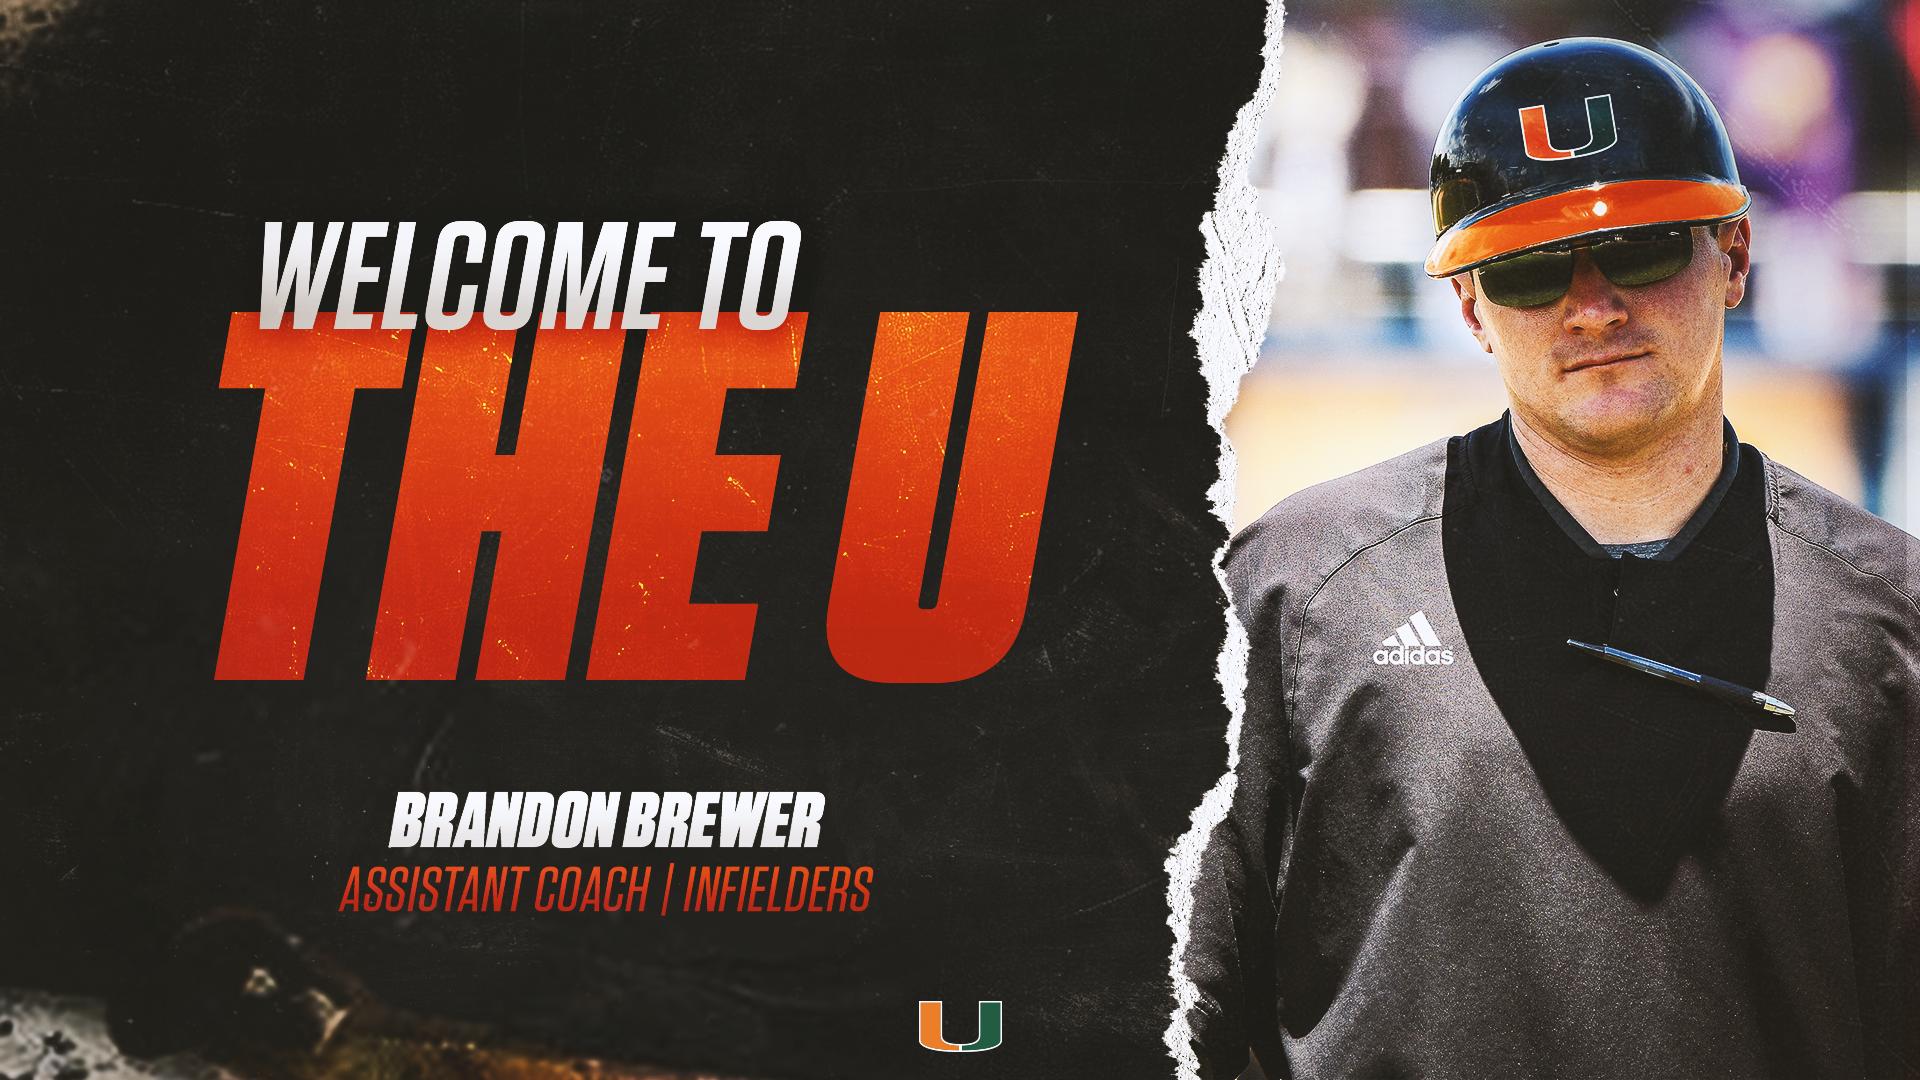 Brandon Brewer Joins Canes Baseball Staff